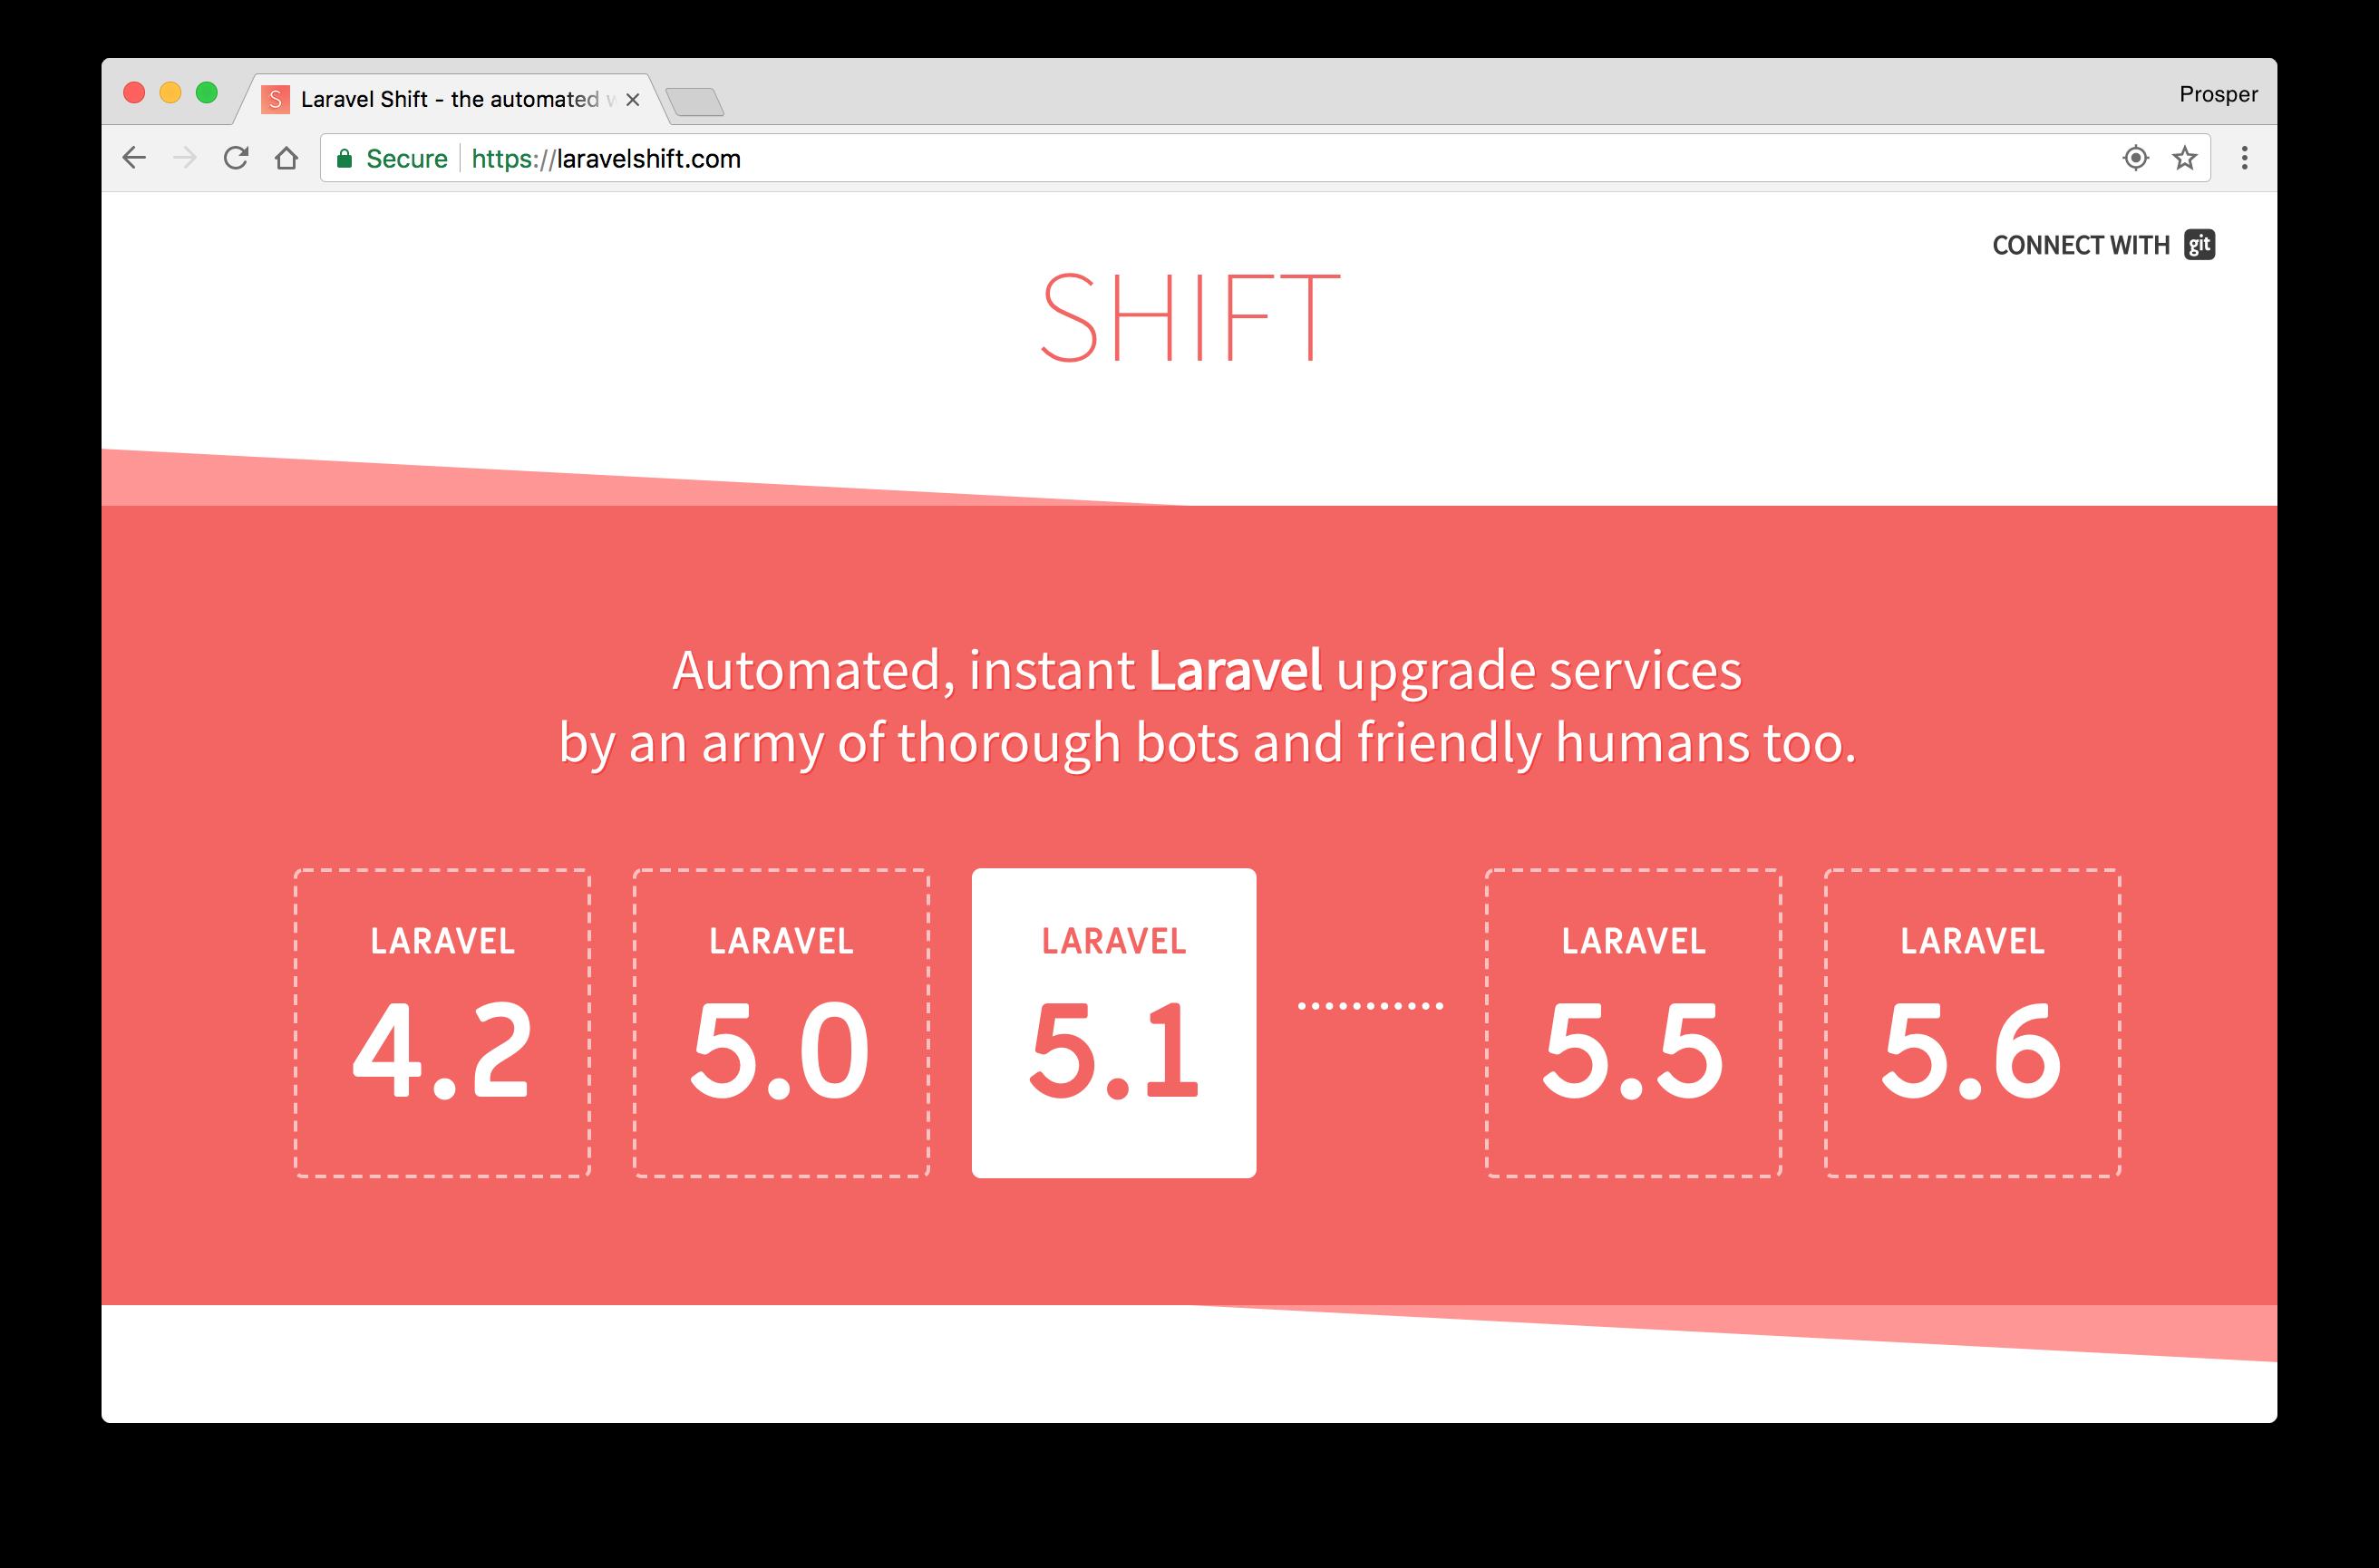 Laravel Shift